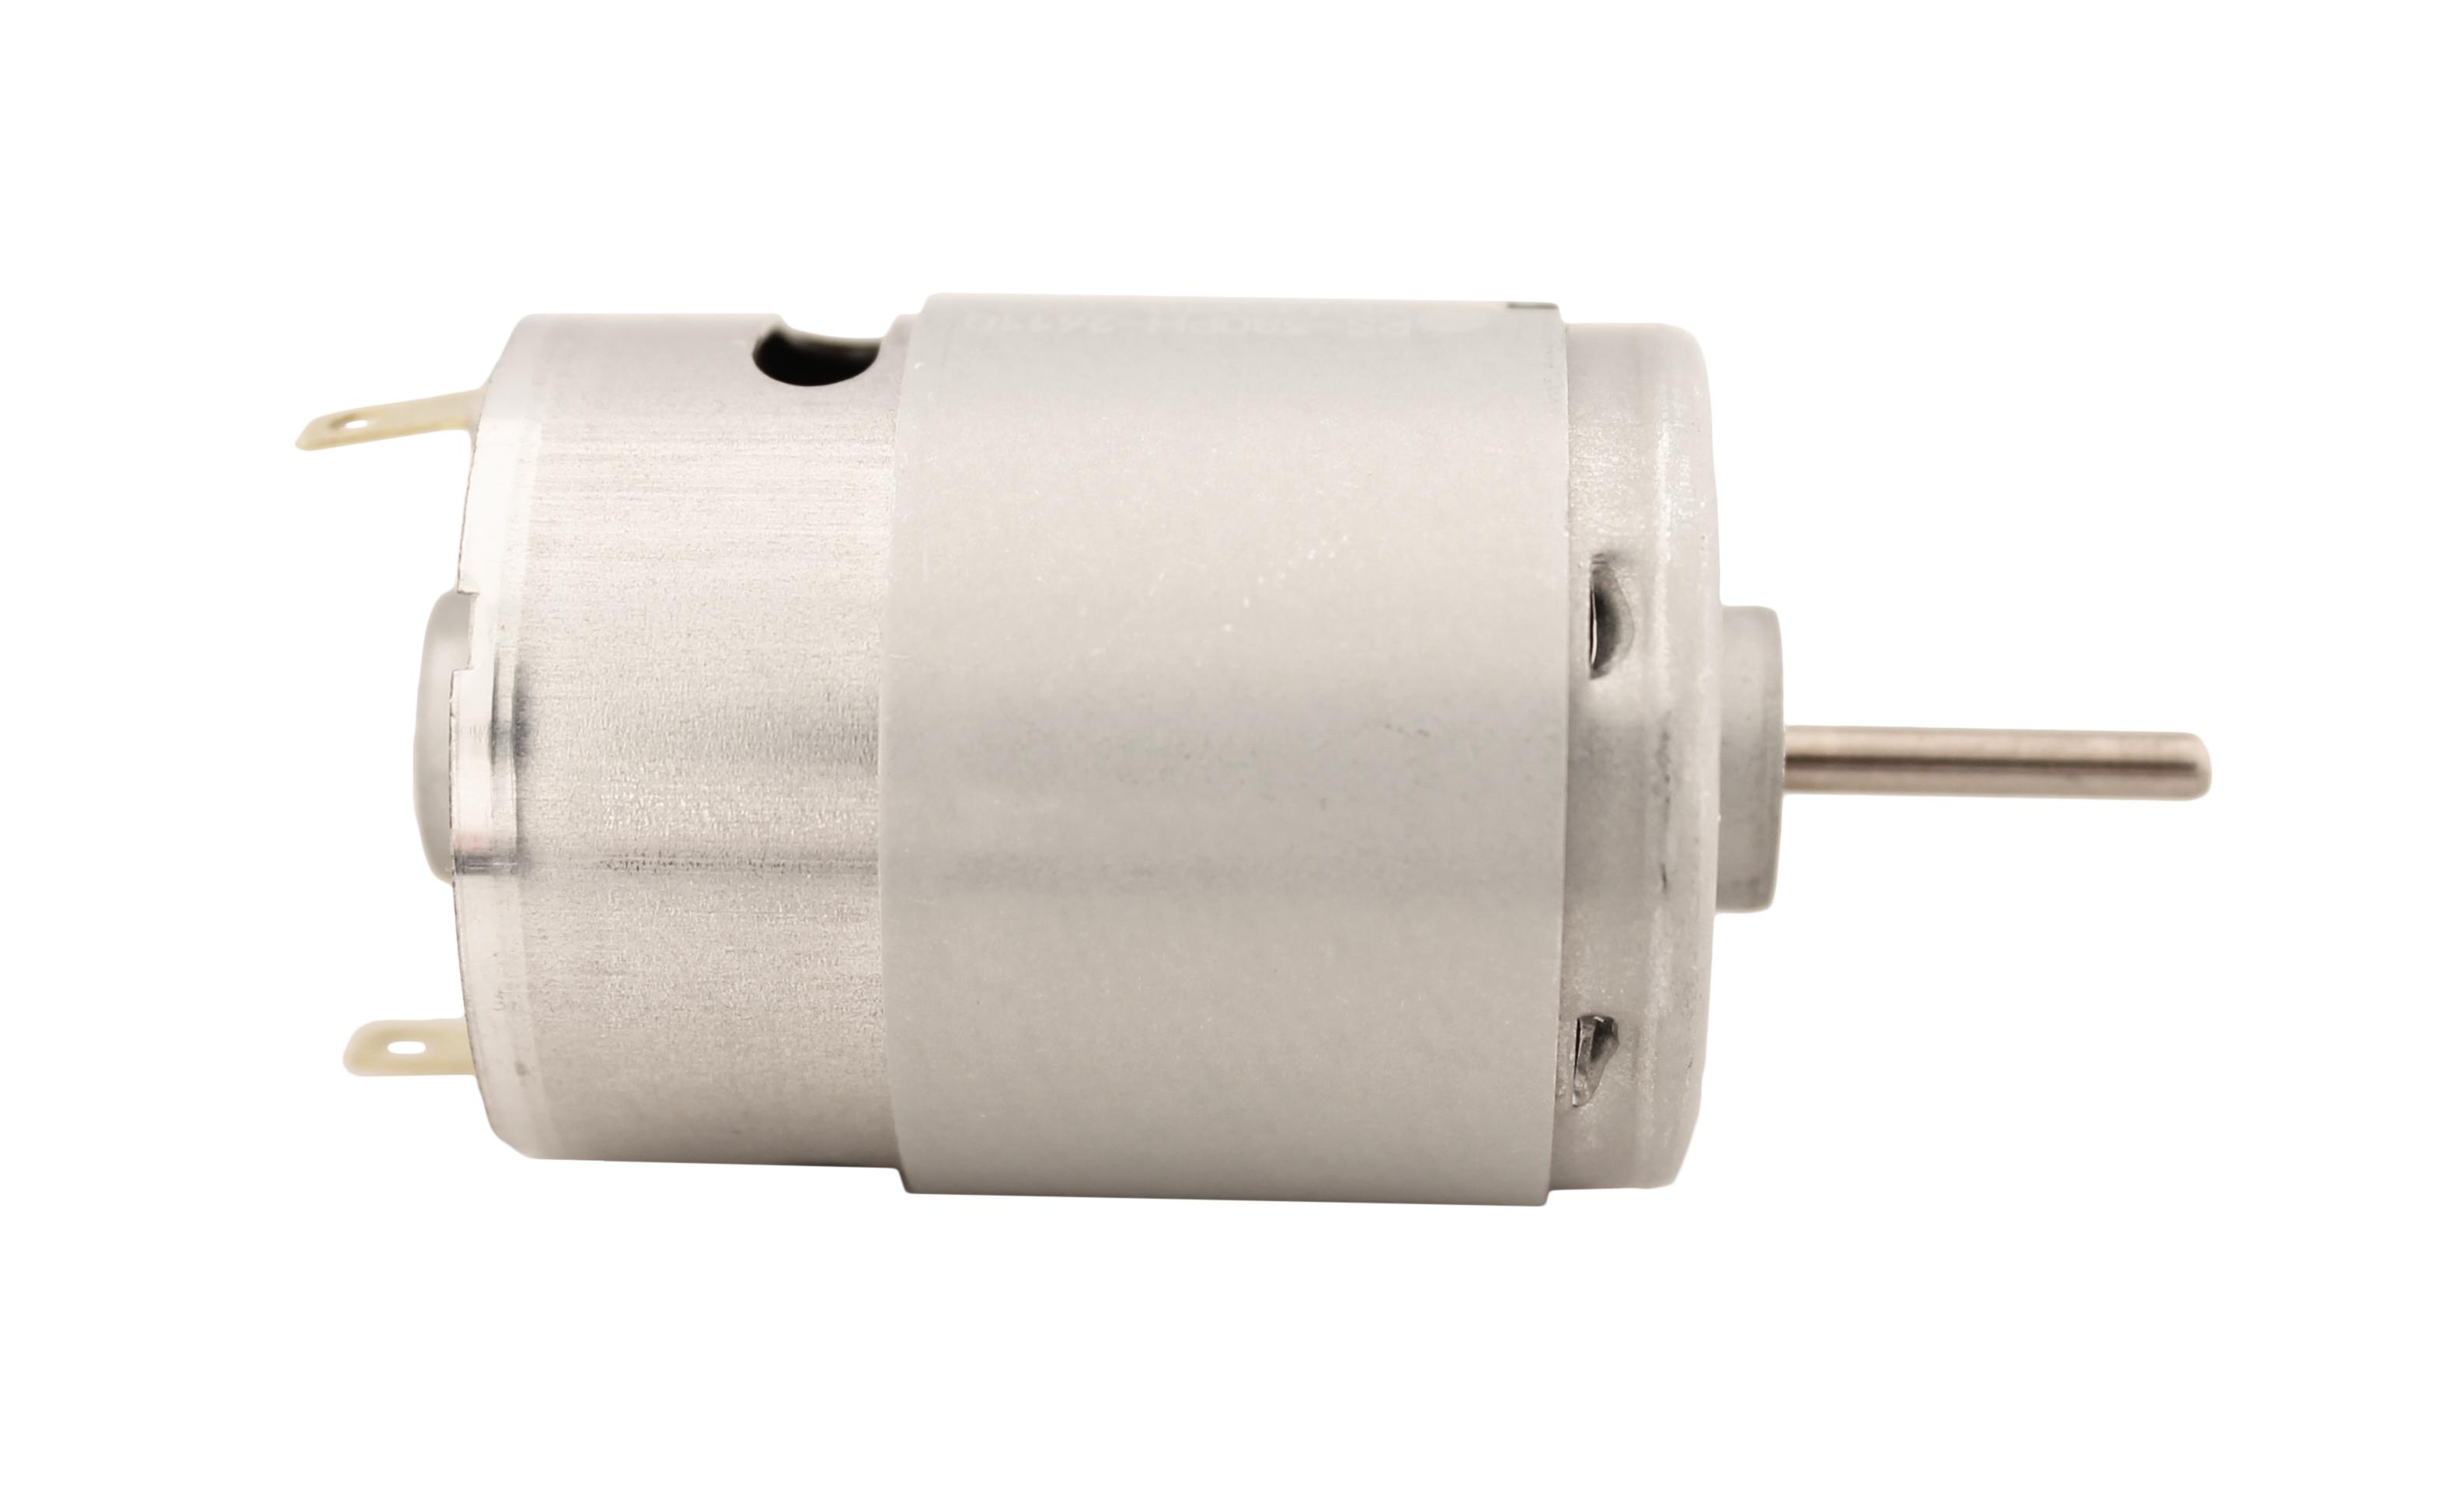 Motor Corriente DC, Voltaje 6.00V, R.P.M. 4800rpm - RS-380 PH 26110 DV.